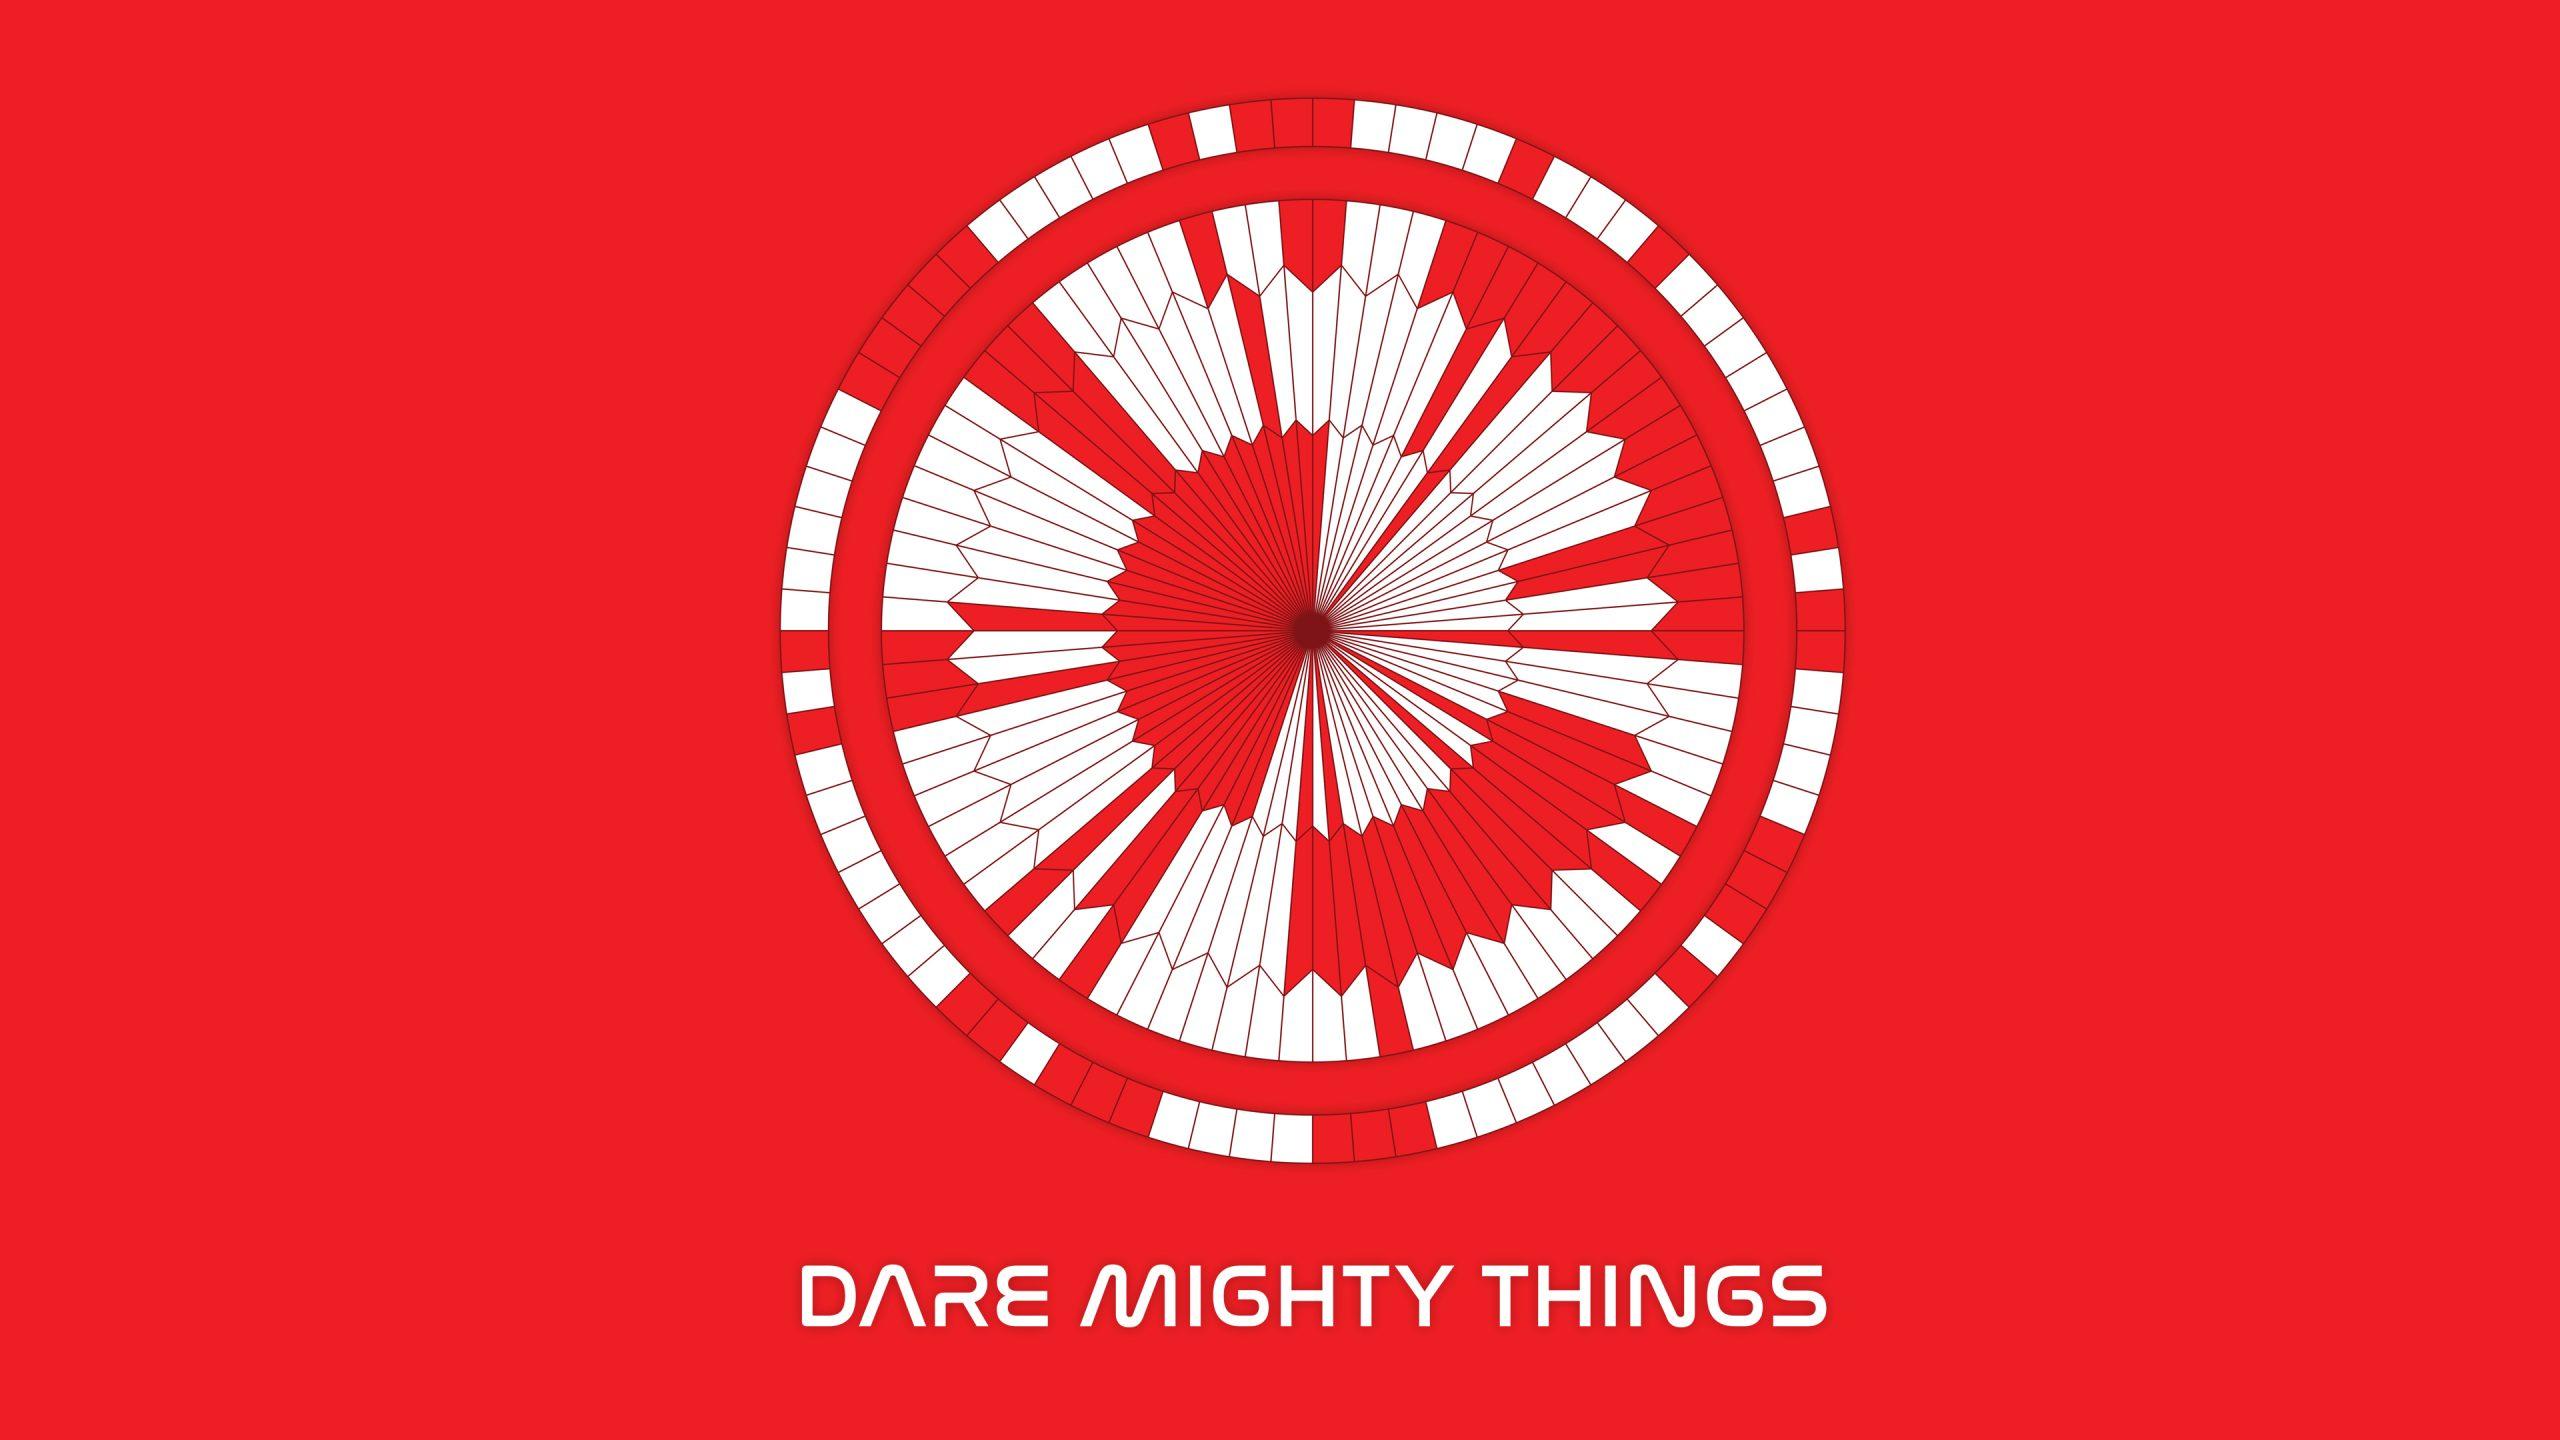 daremightythings-red-3840x2160